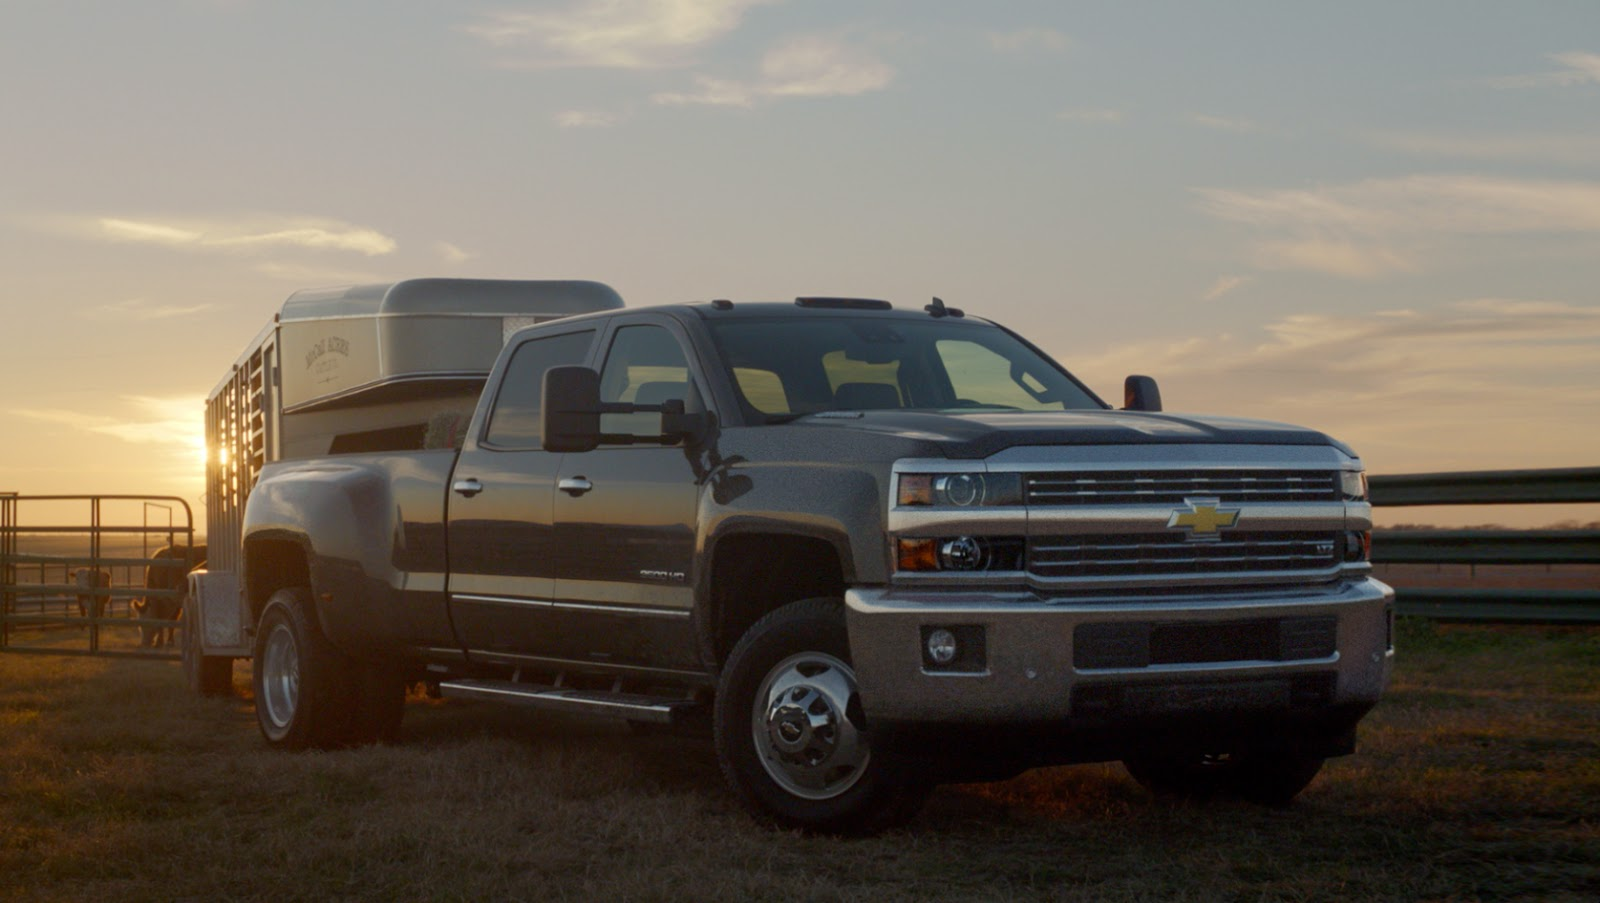 Chevrolet Returns to the Super Bowl